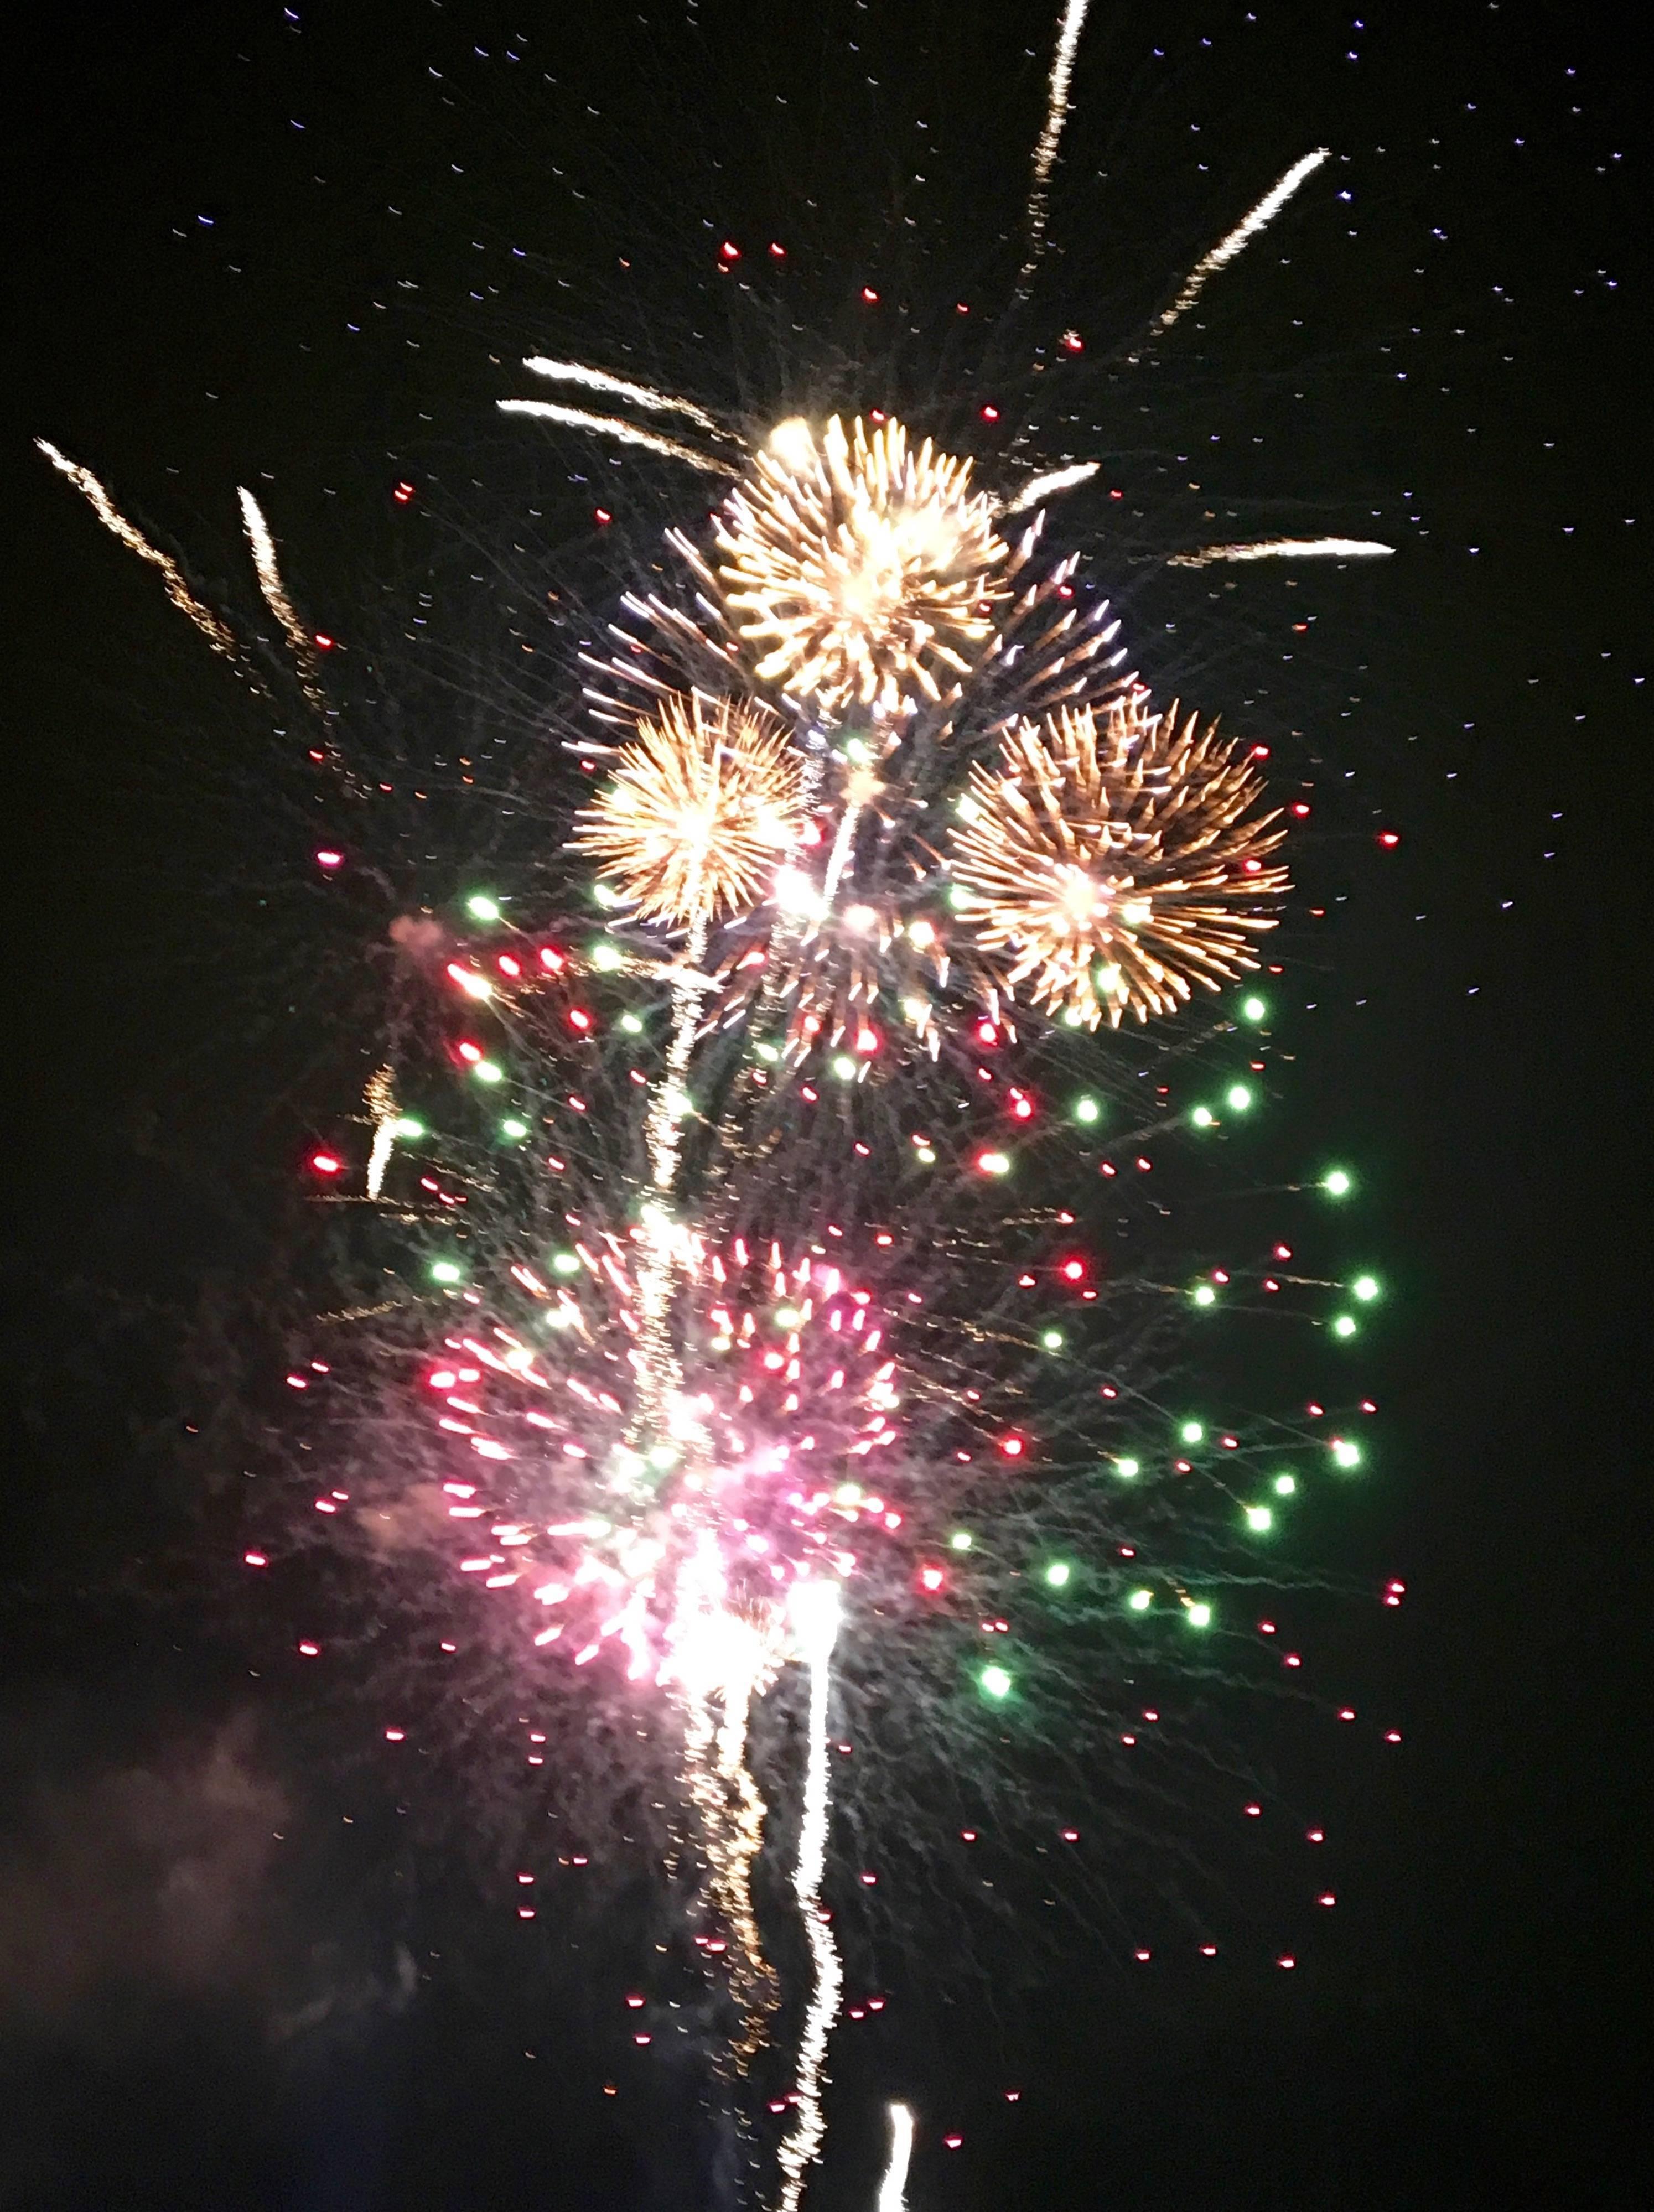 d9cf4e0a48da4a35495f_Fireworks__1.jpg